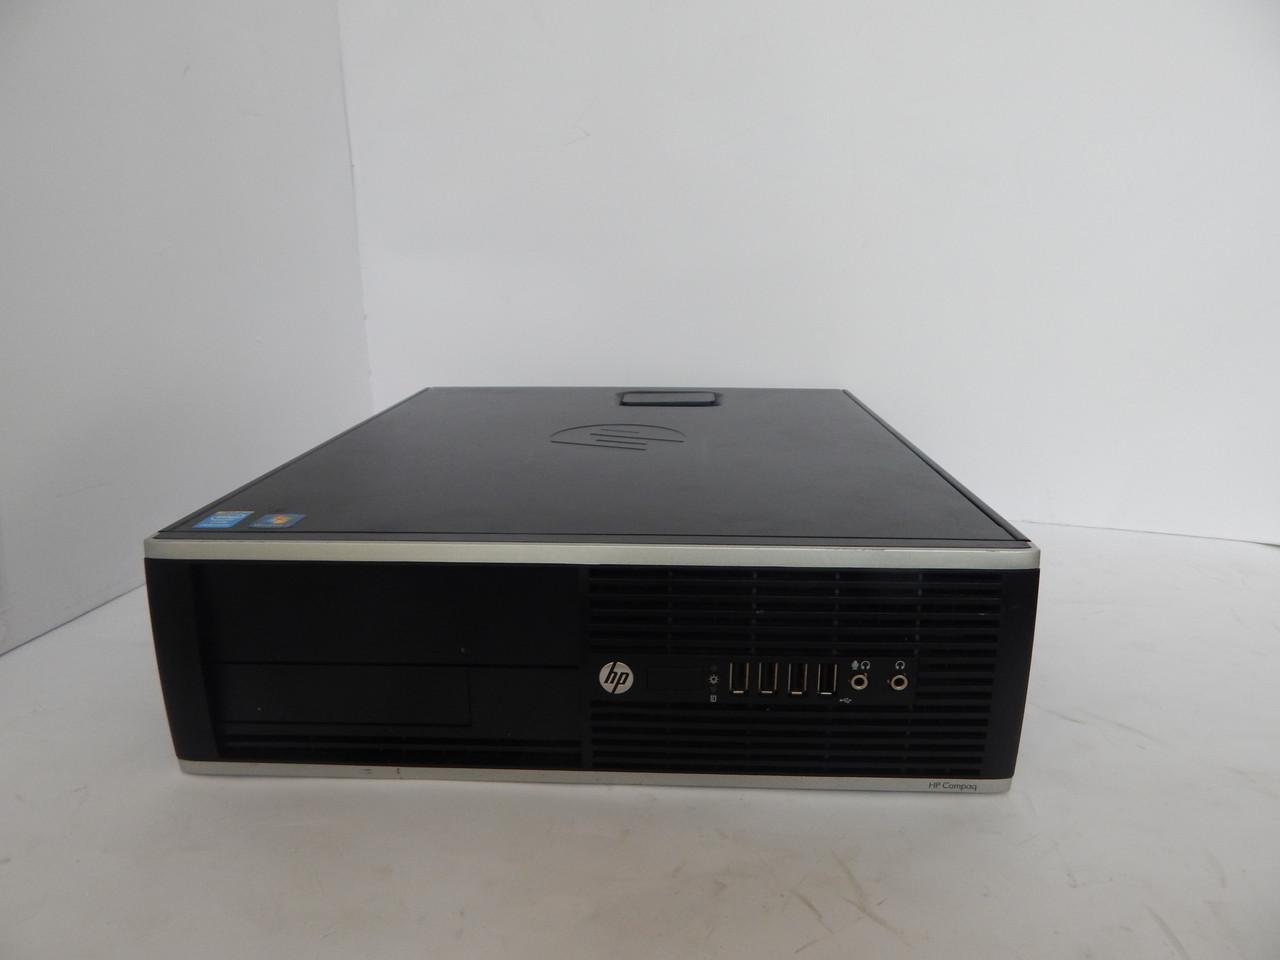 Компьютер системный блок HP i3 2100 ОЗУ 4ГБ ddr3 диск 250ГБ soket 1155